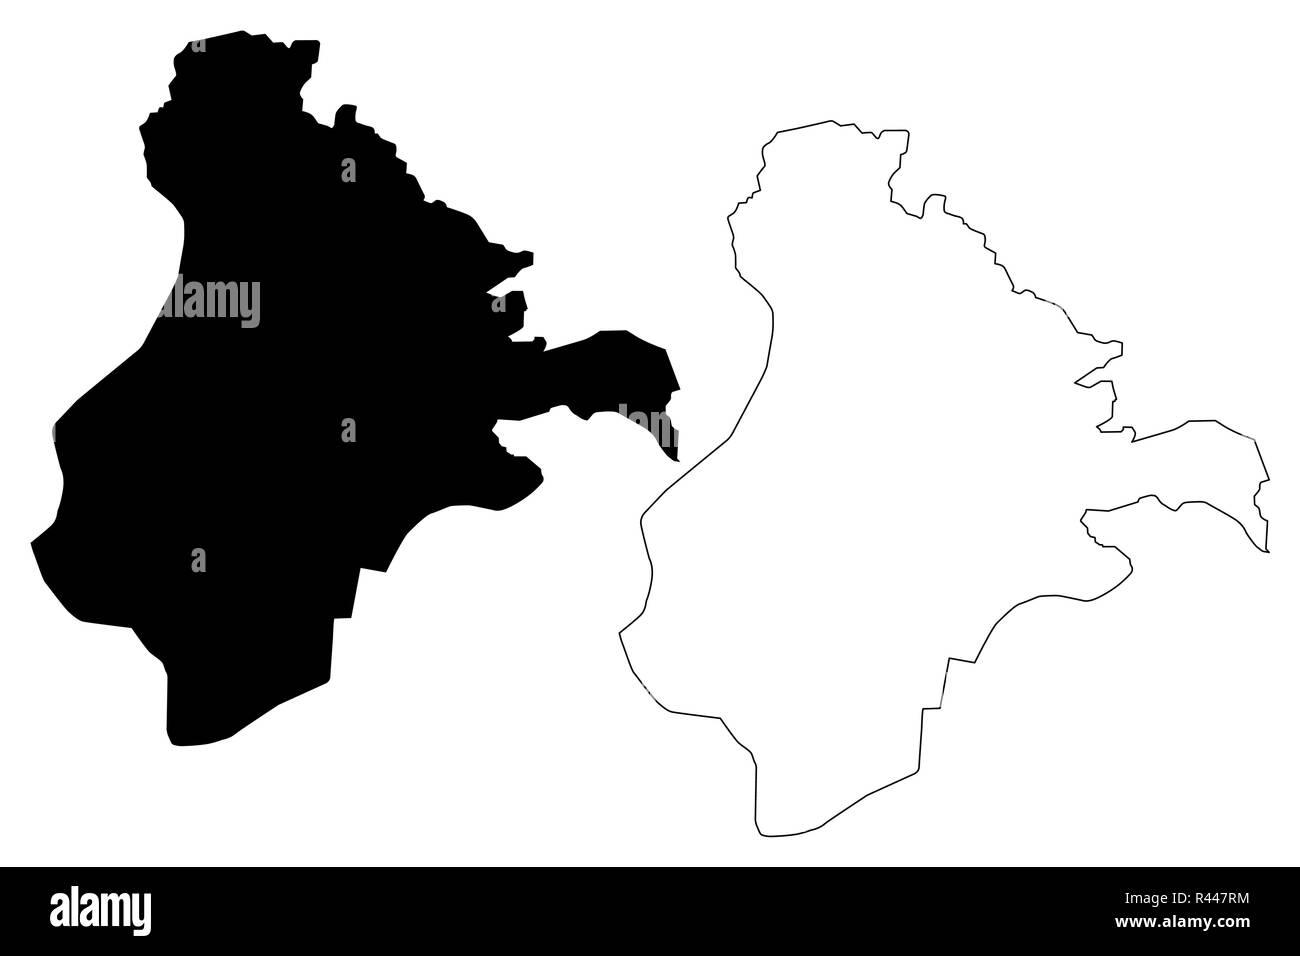 Ardahan (Provinces of the Republic of Turkey) map vector illustration, scribble sketch Ardahan ili map - Stock Image